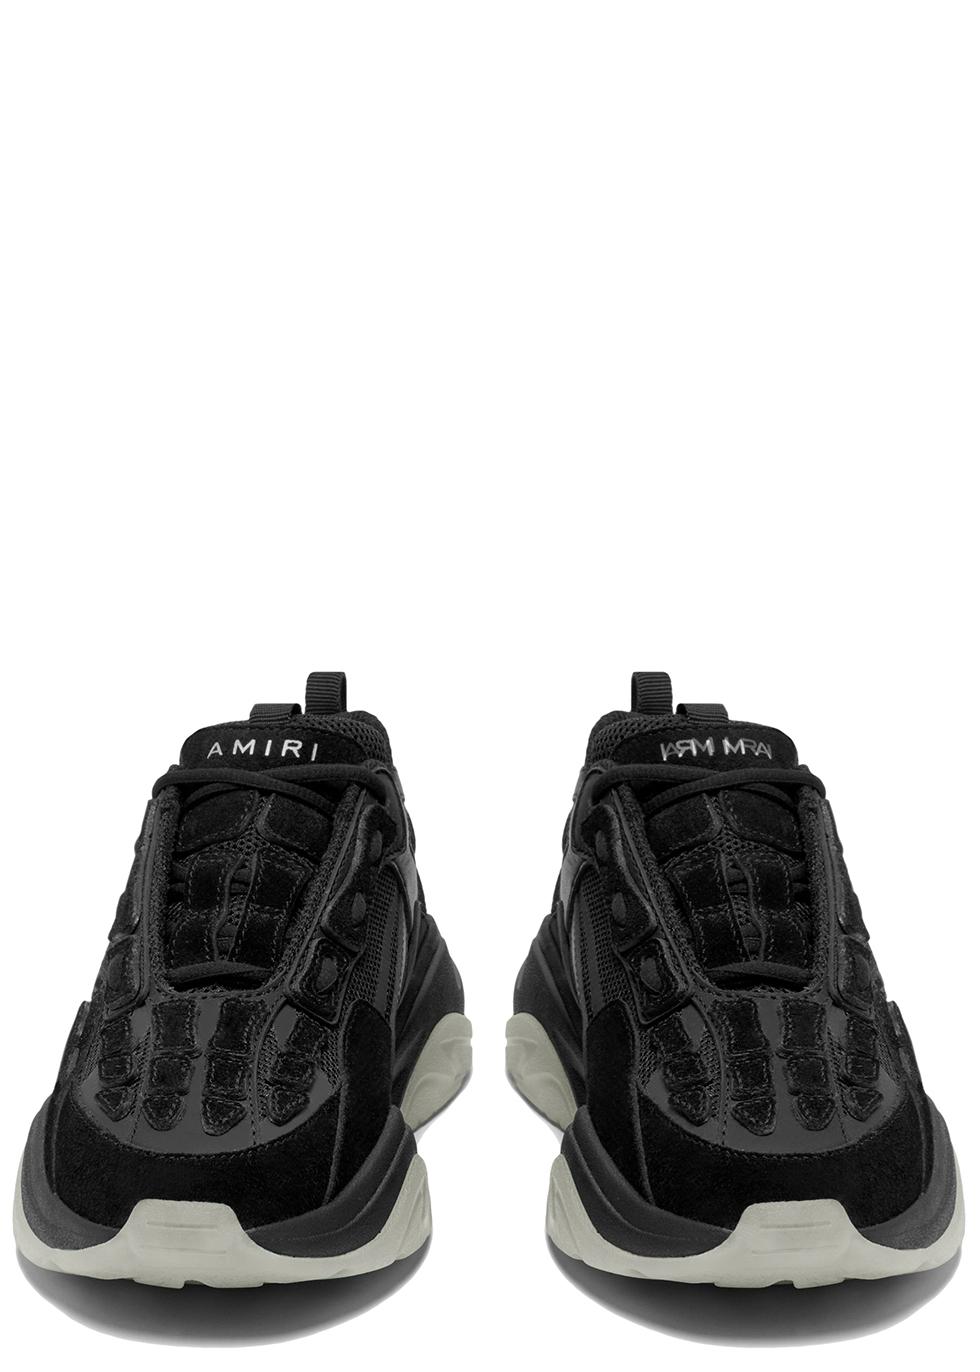 mike amiri sneakers